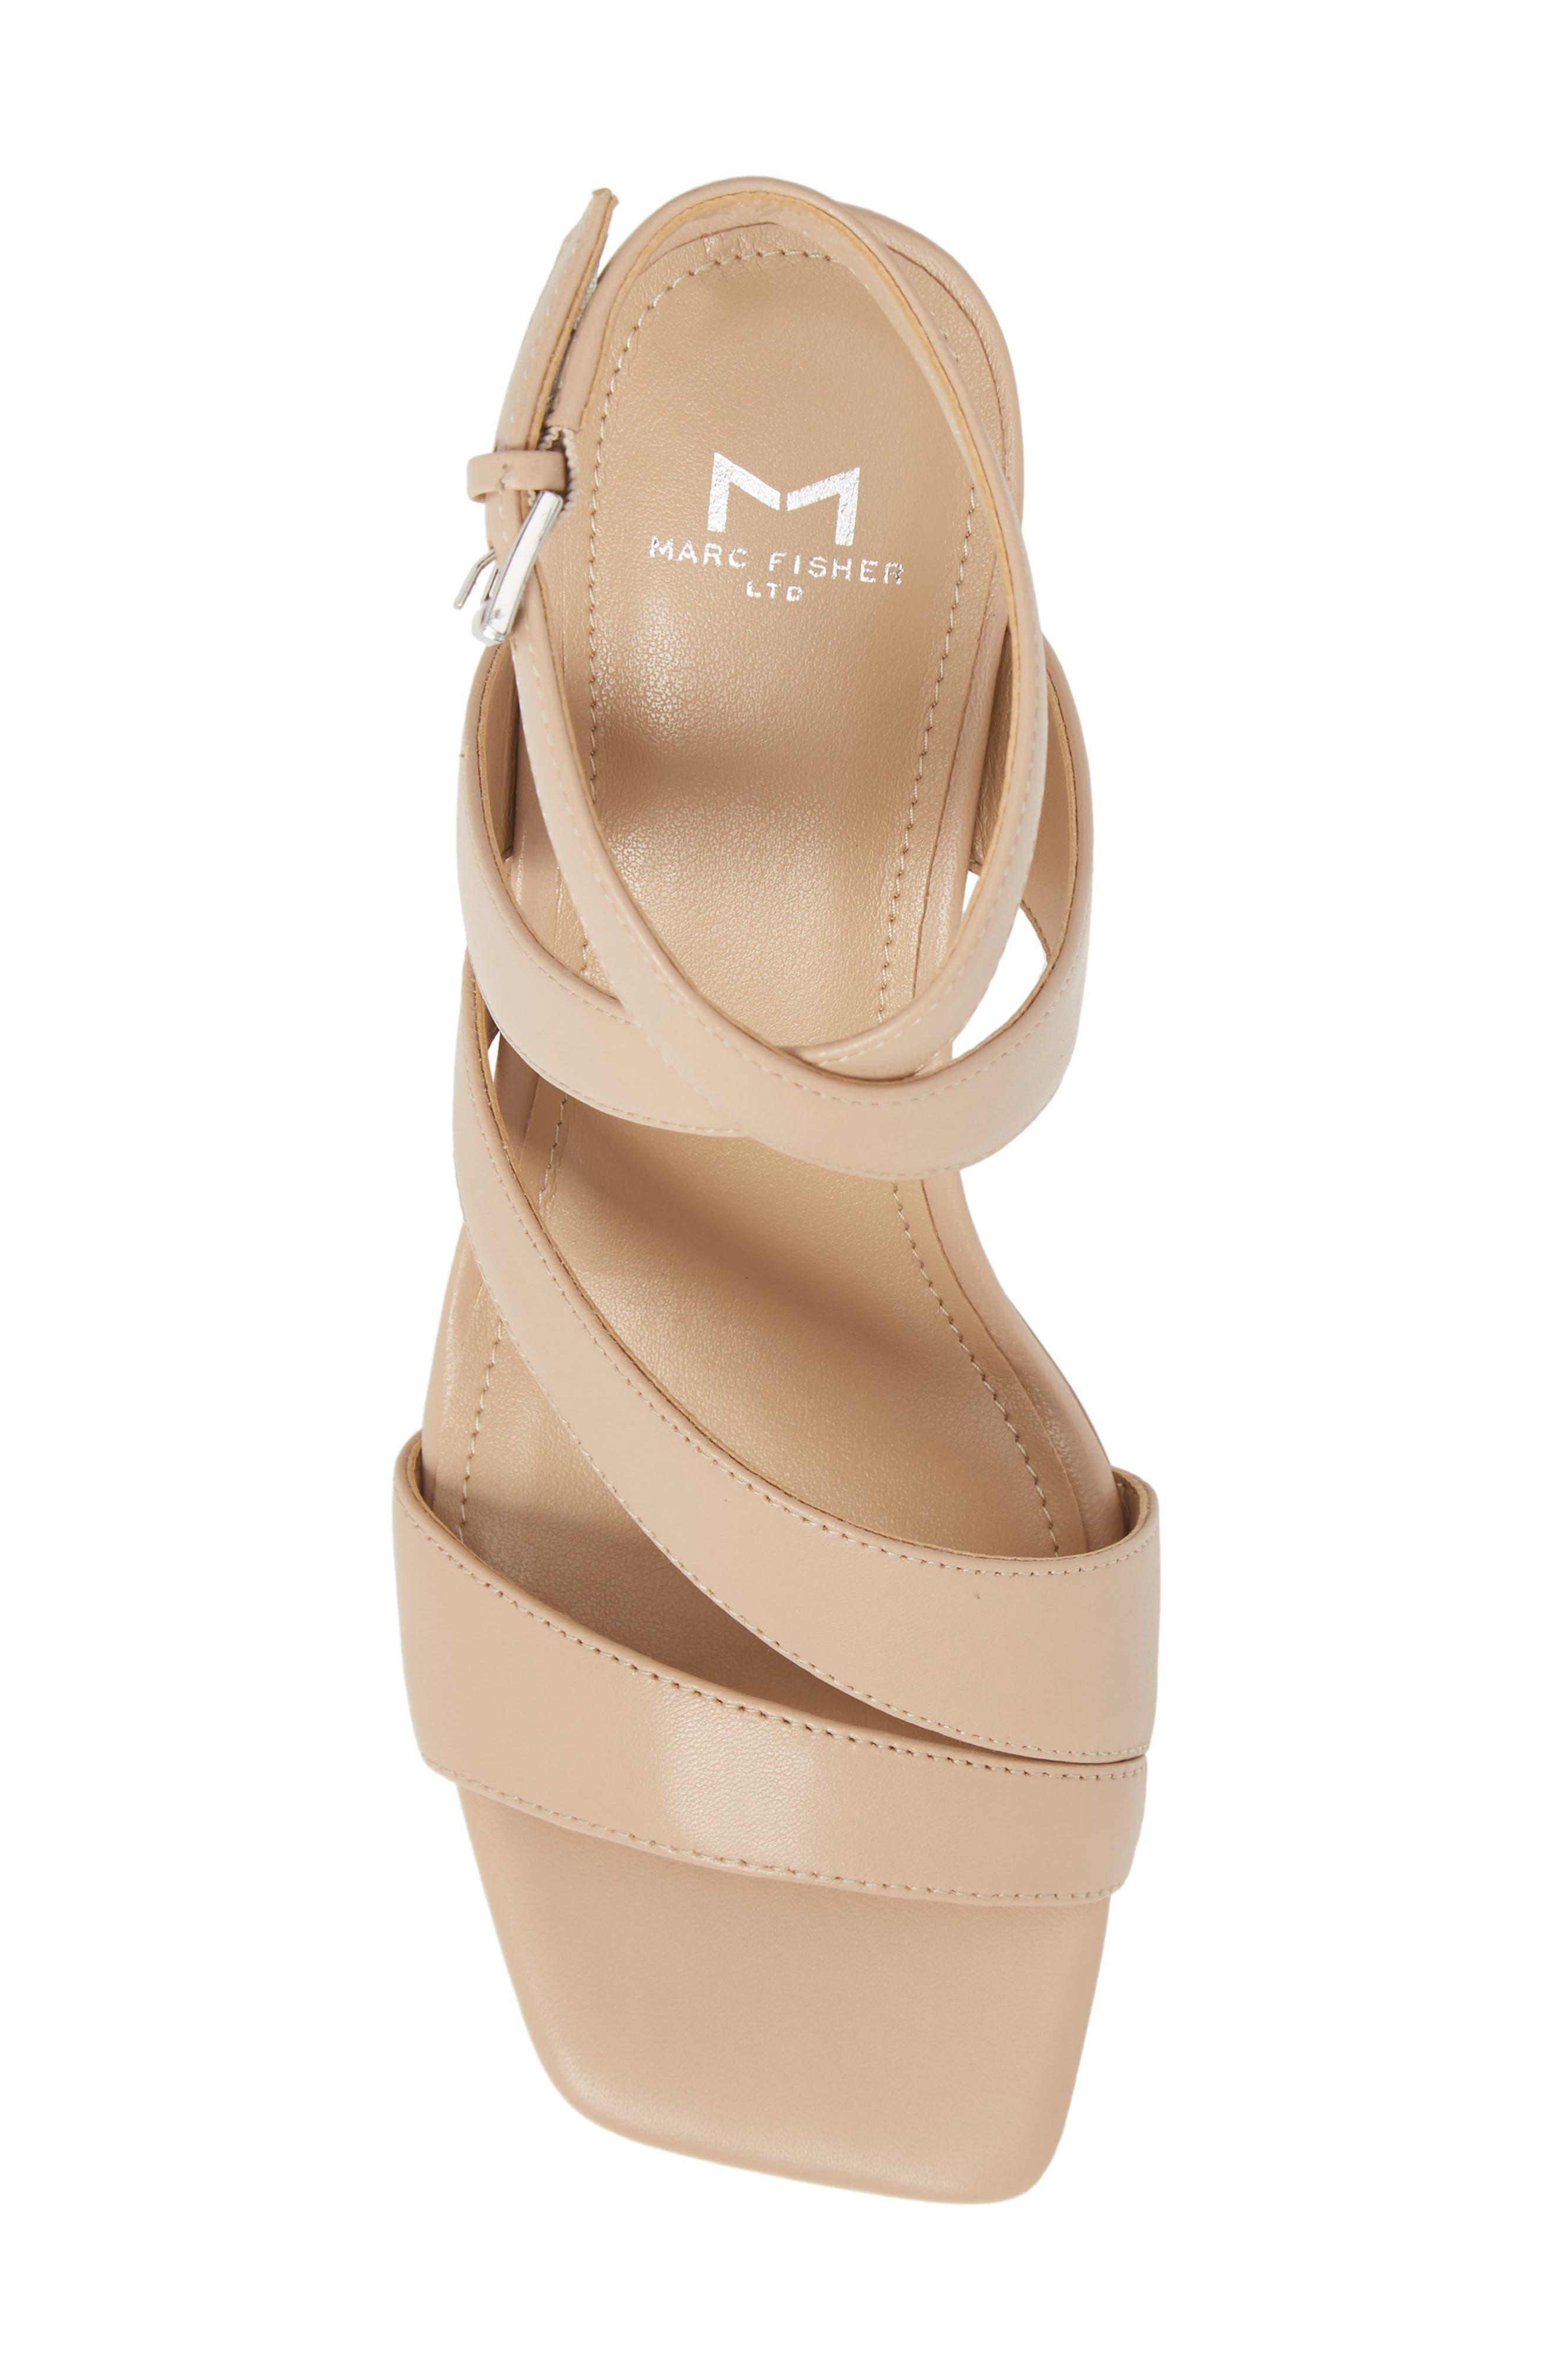 Marc Fischer LTD Idana Strappy Sandal,                             Alternate thumbnail 5, color,                             Lite Latte Leather